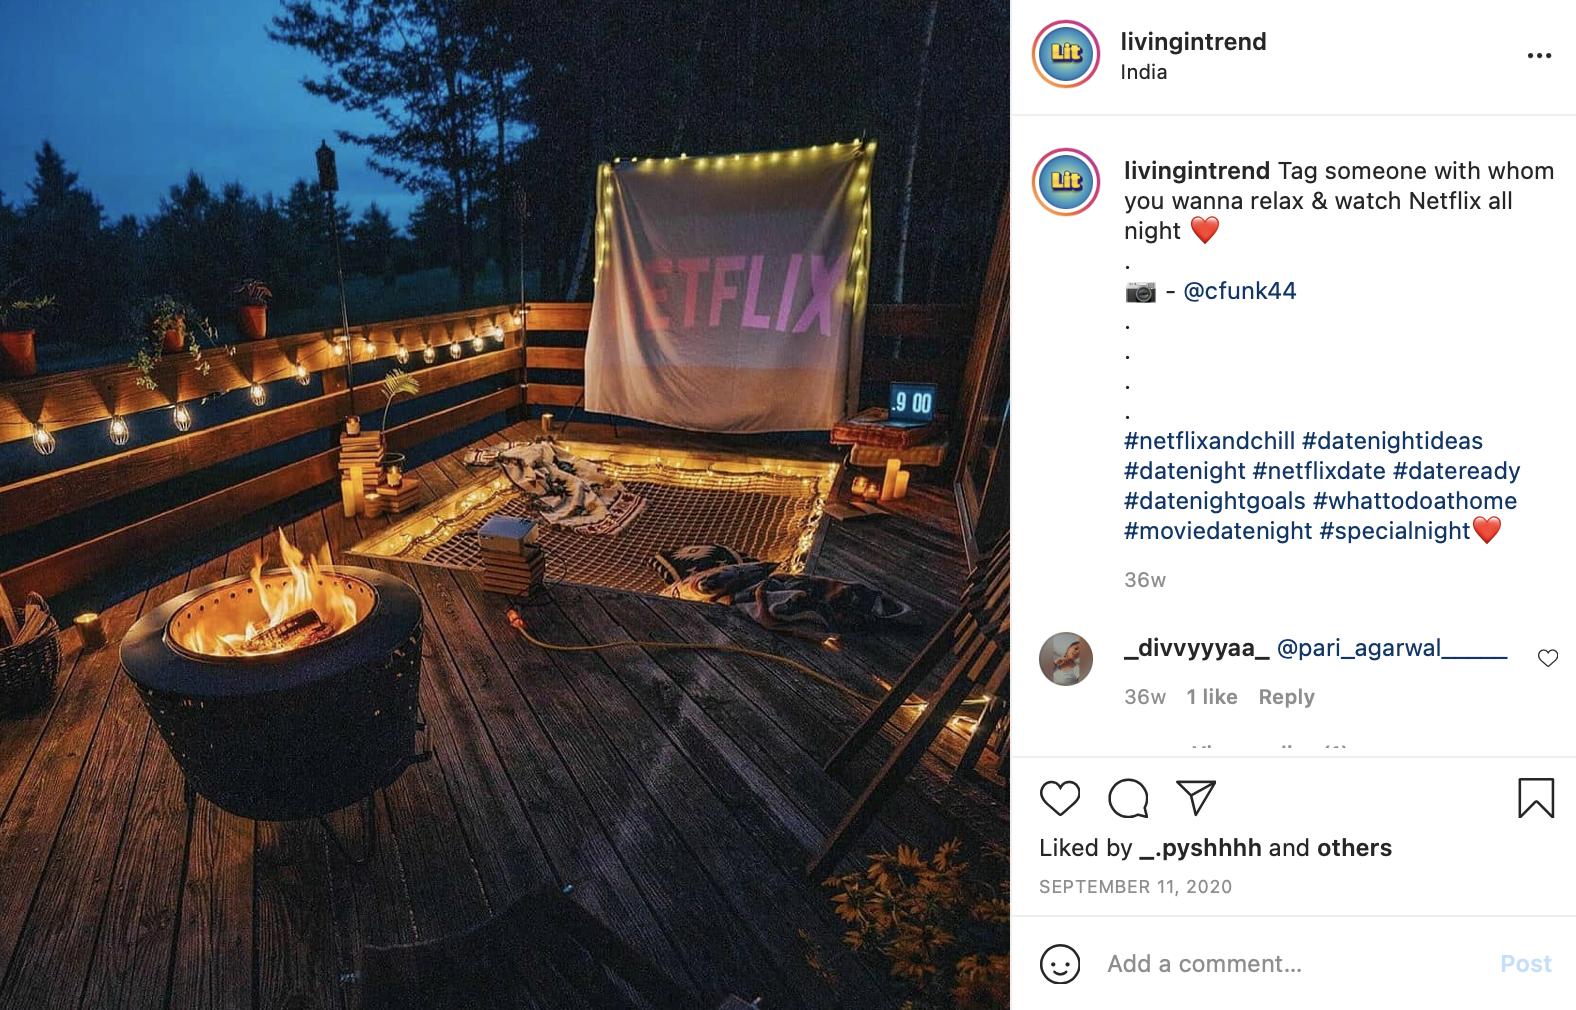 dinner & movie newly-wed date night idea